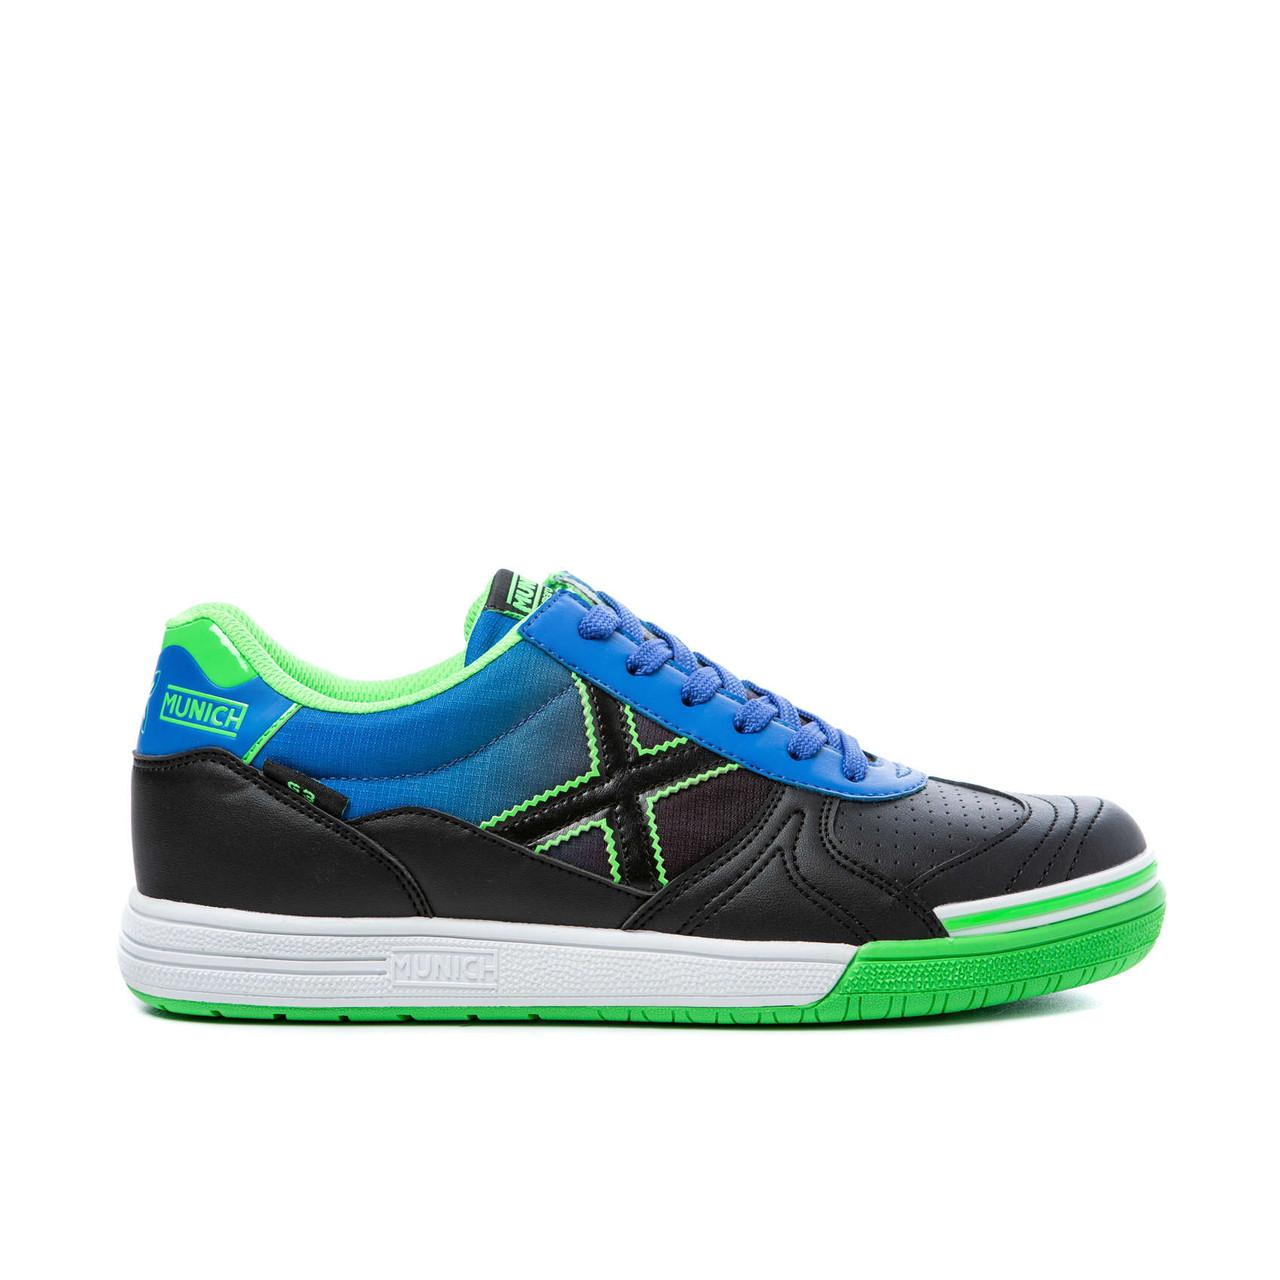 Футзалки MUNICH X G3 INDOOR 1019  обувь для зала.